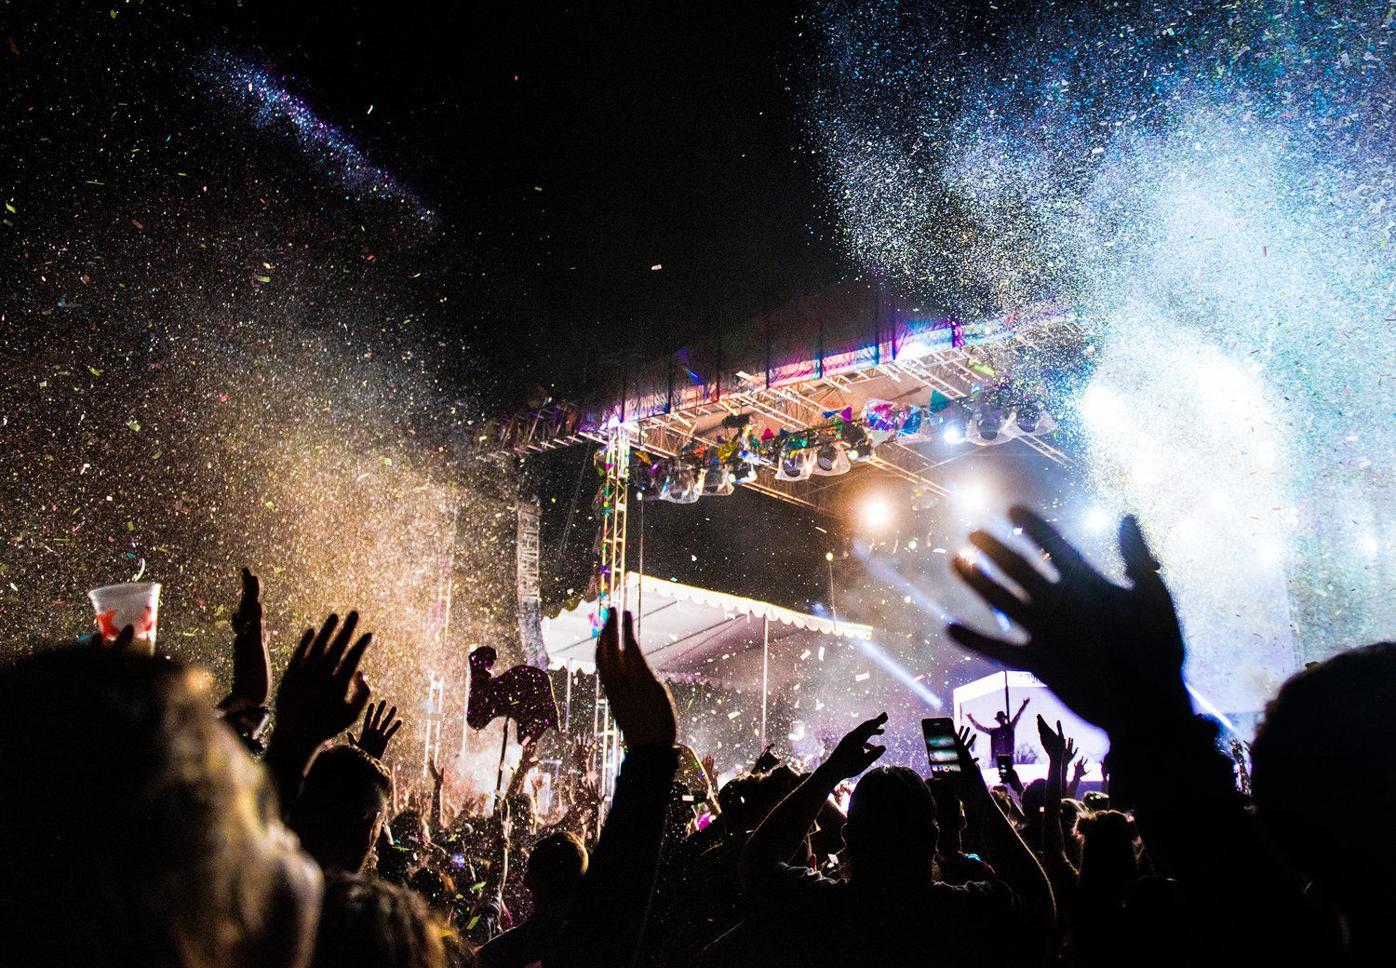 Photo Gallery: Taos Vortex kicks off three-day music festival